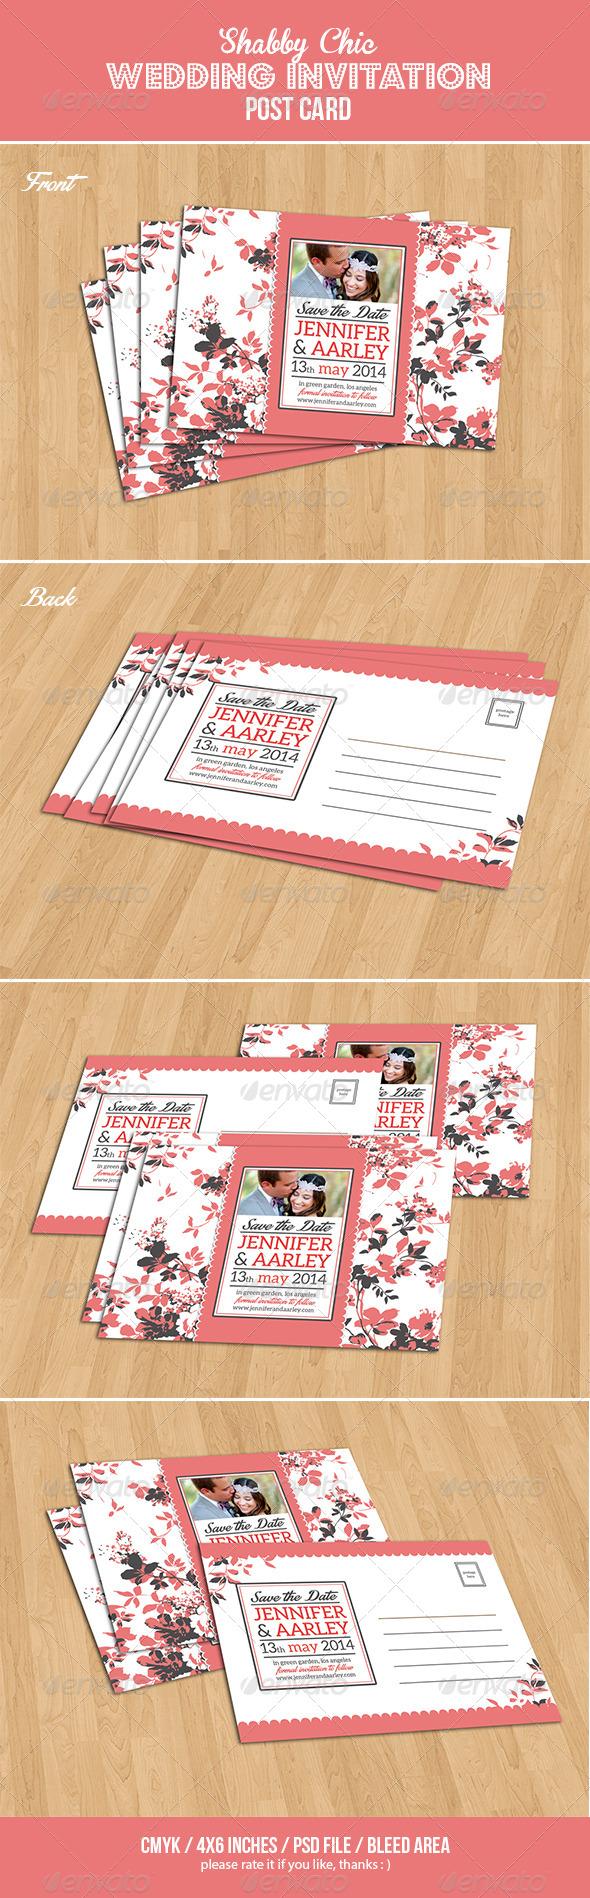 GraphicRiver Shabby Chic Wedding Invitation Post Card Vol.2 7077659